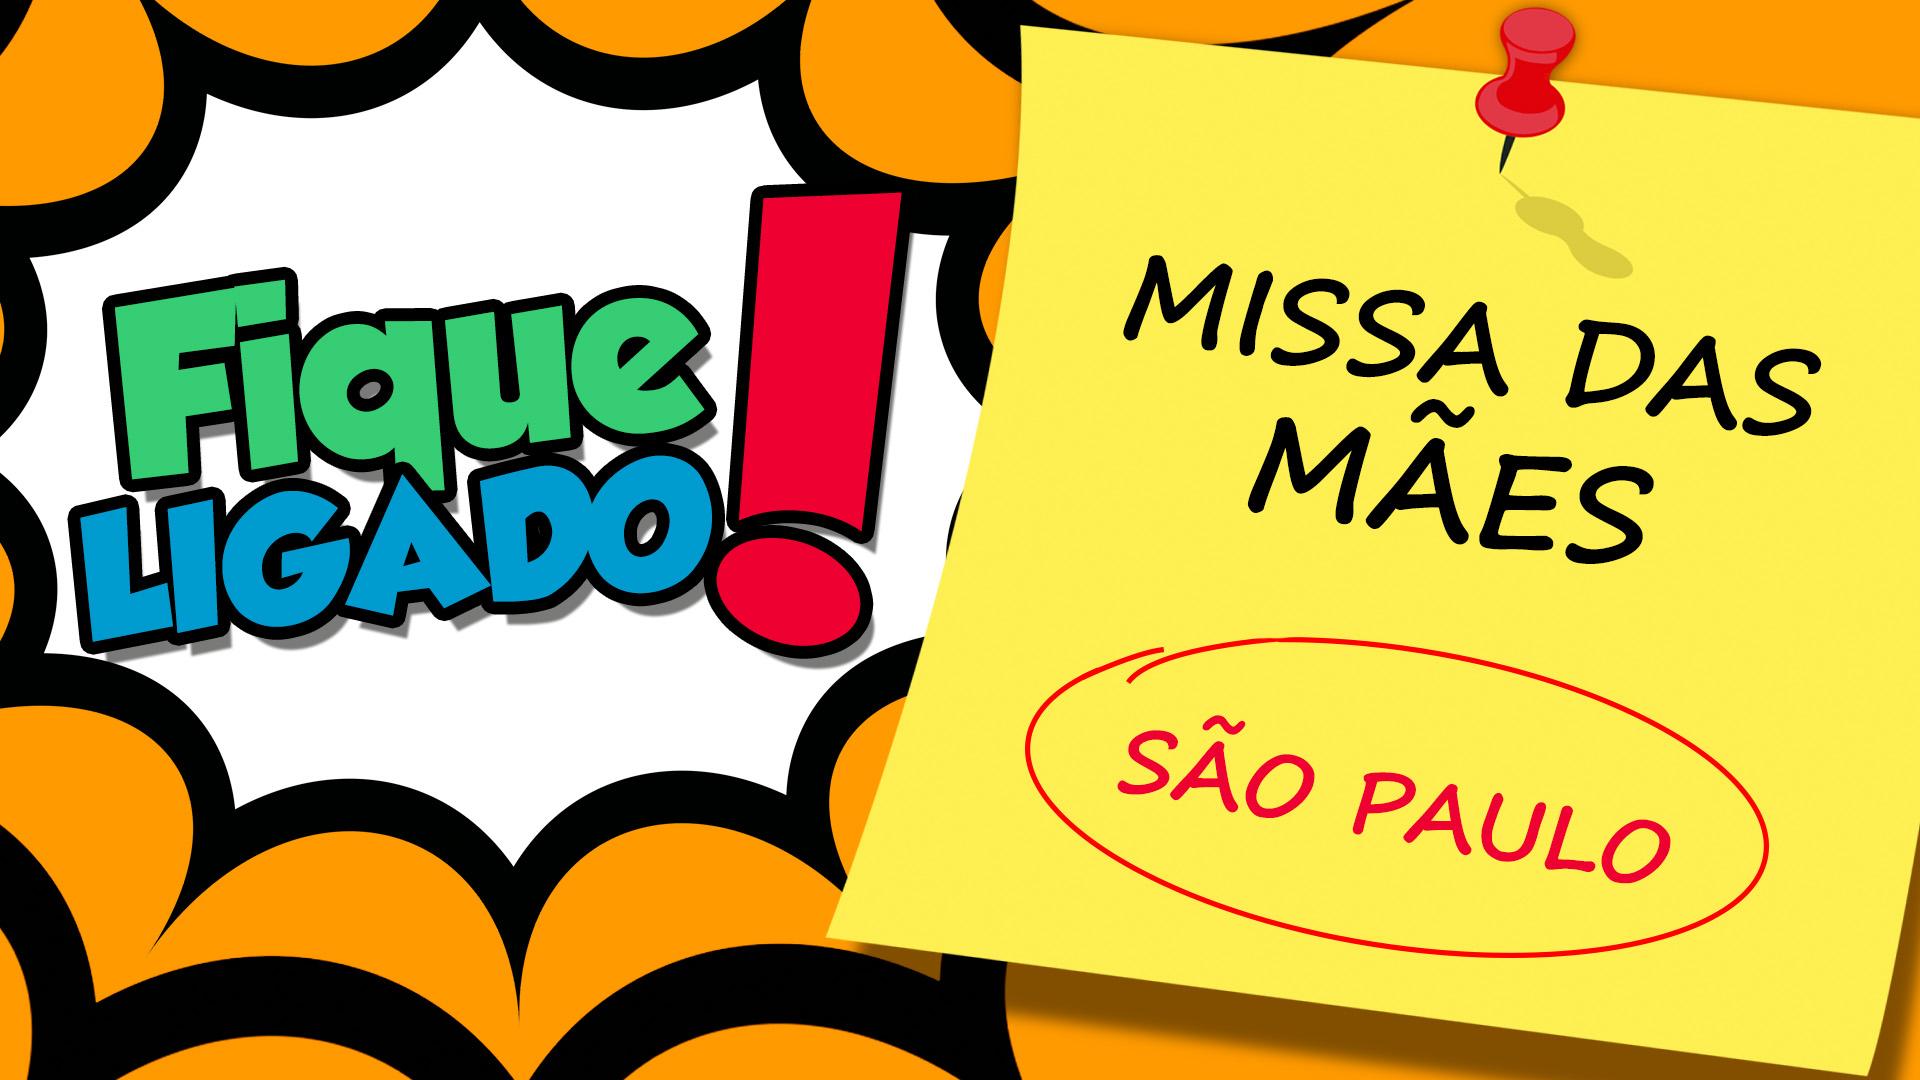 [Missa das Mães - São Paulo]